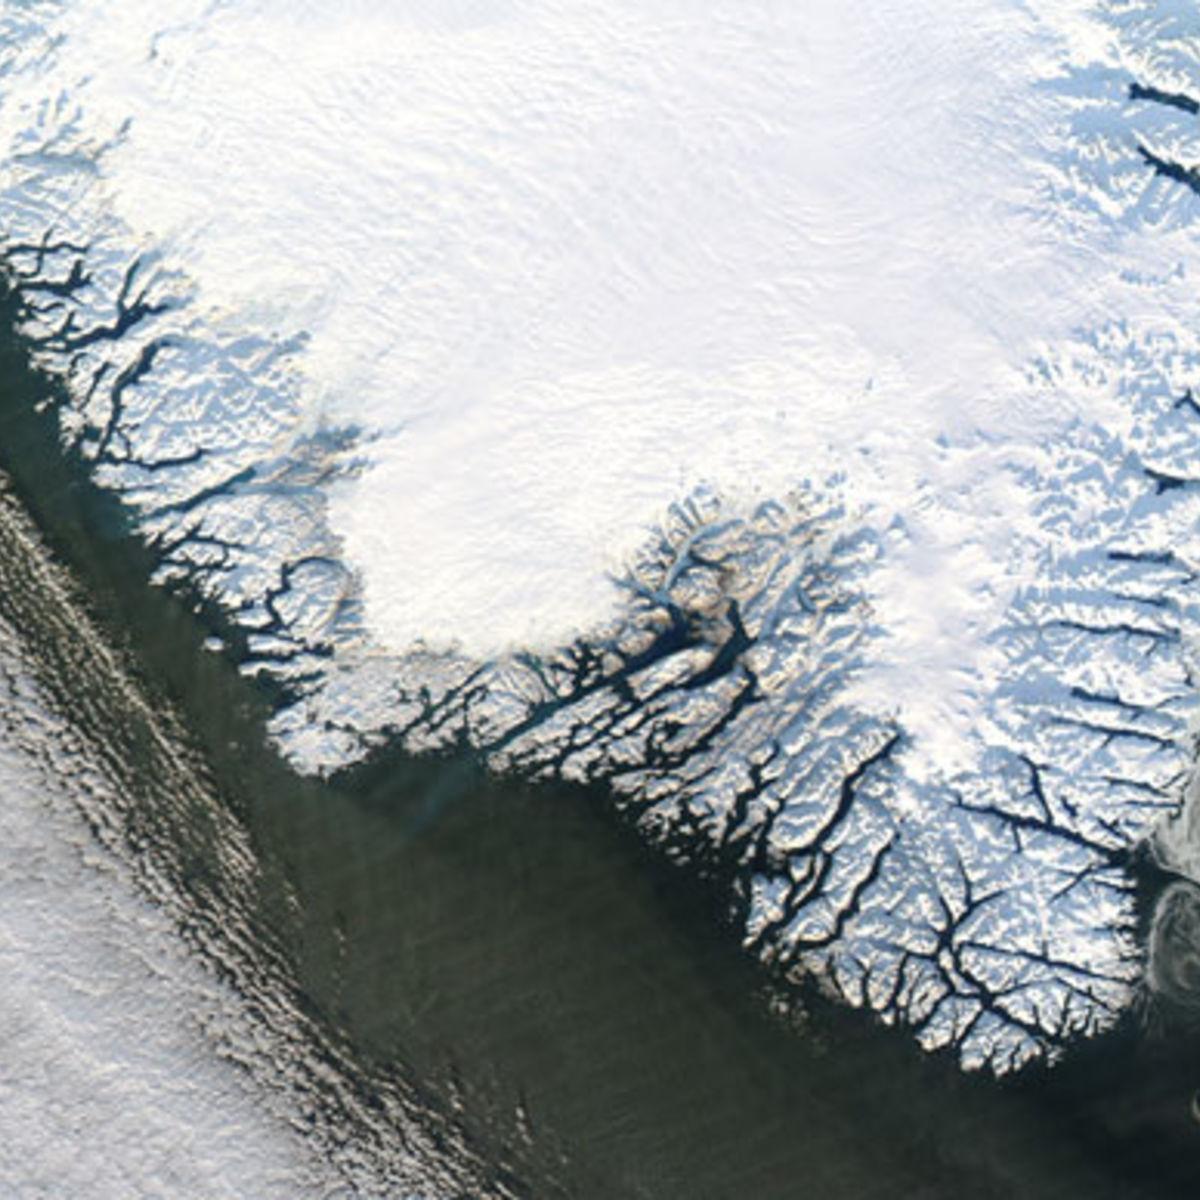 aqua_greenland_ice_dec302012.jpg